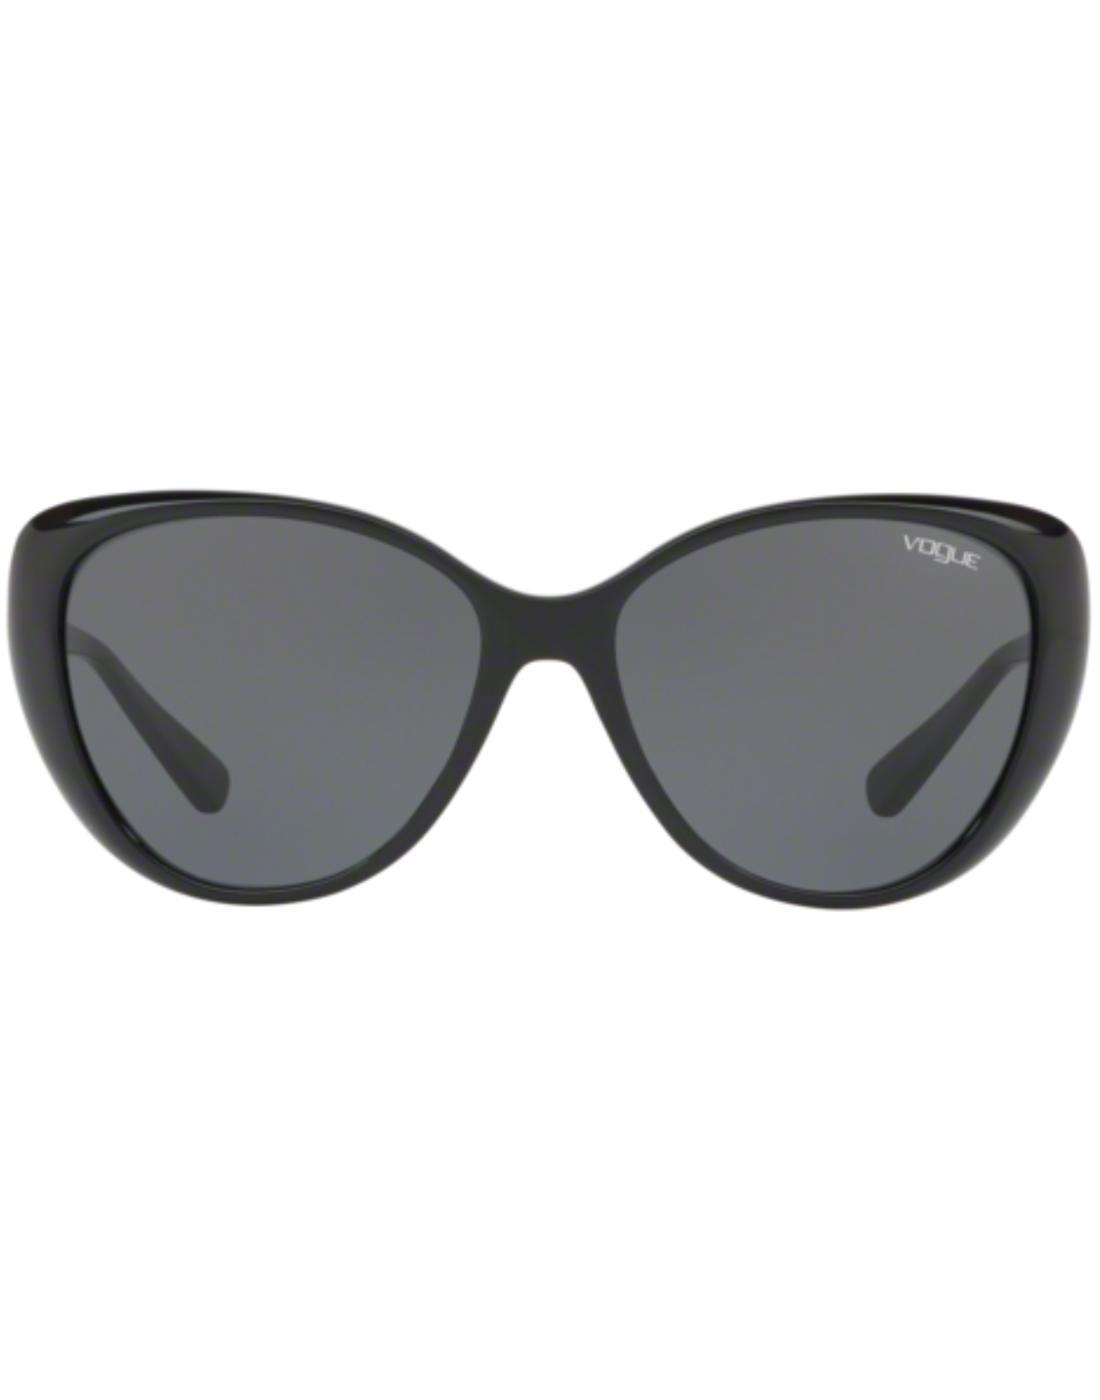 VOGUE Retro 60s Vintage Cats-Eye Daisy Sunglasses